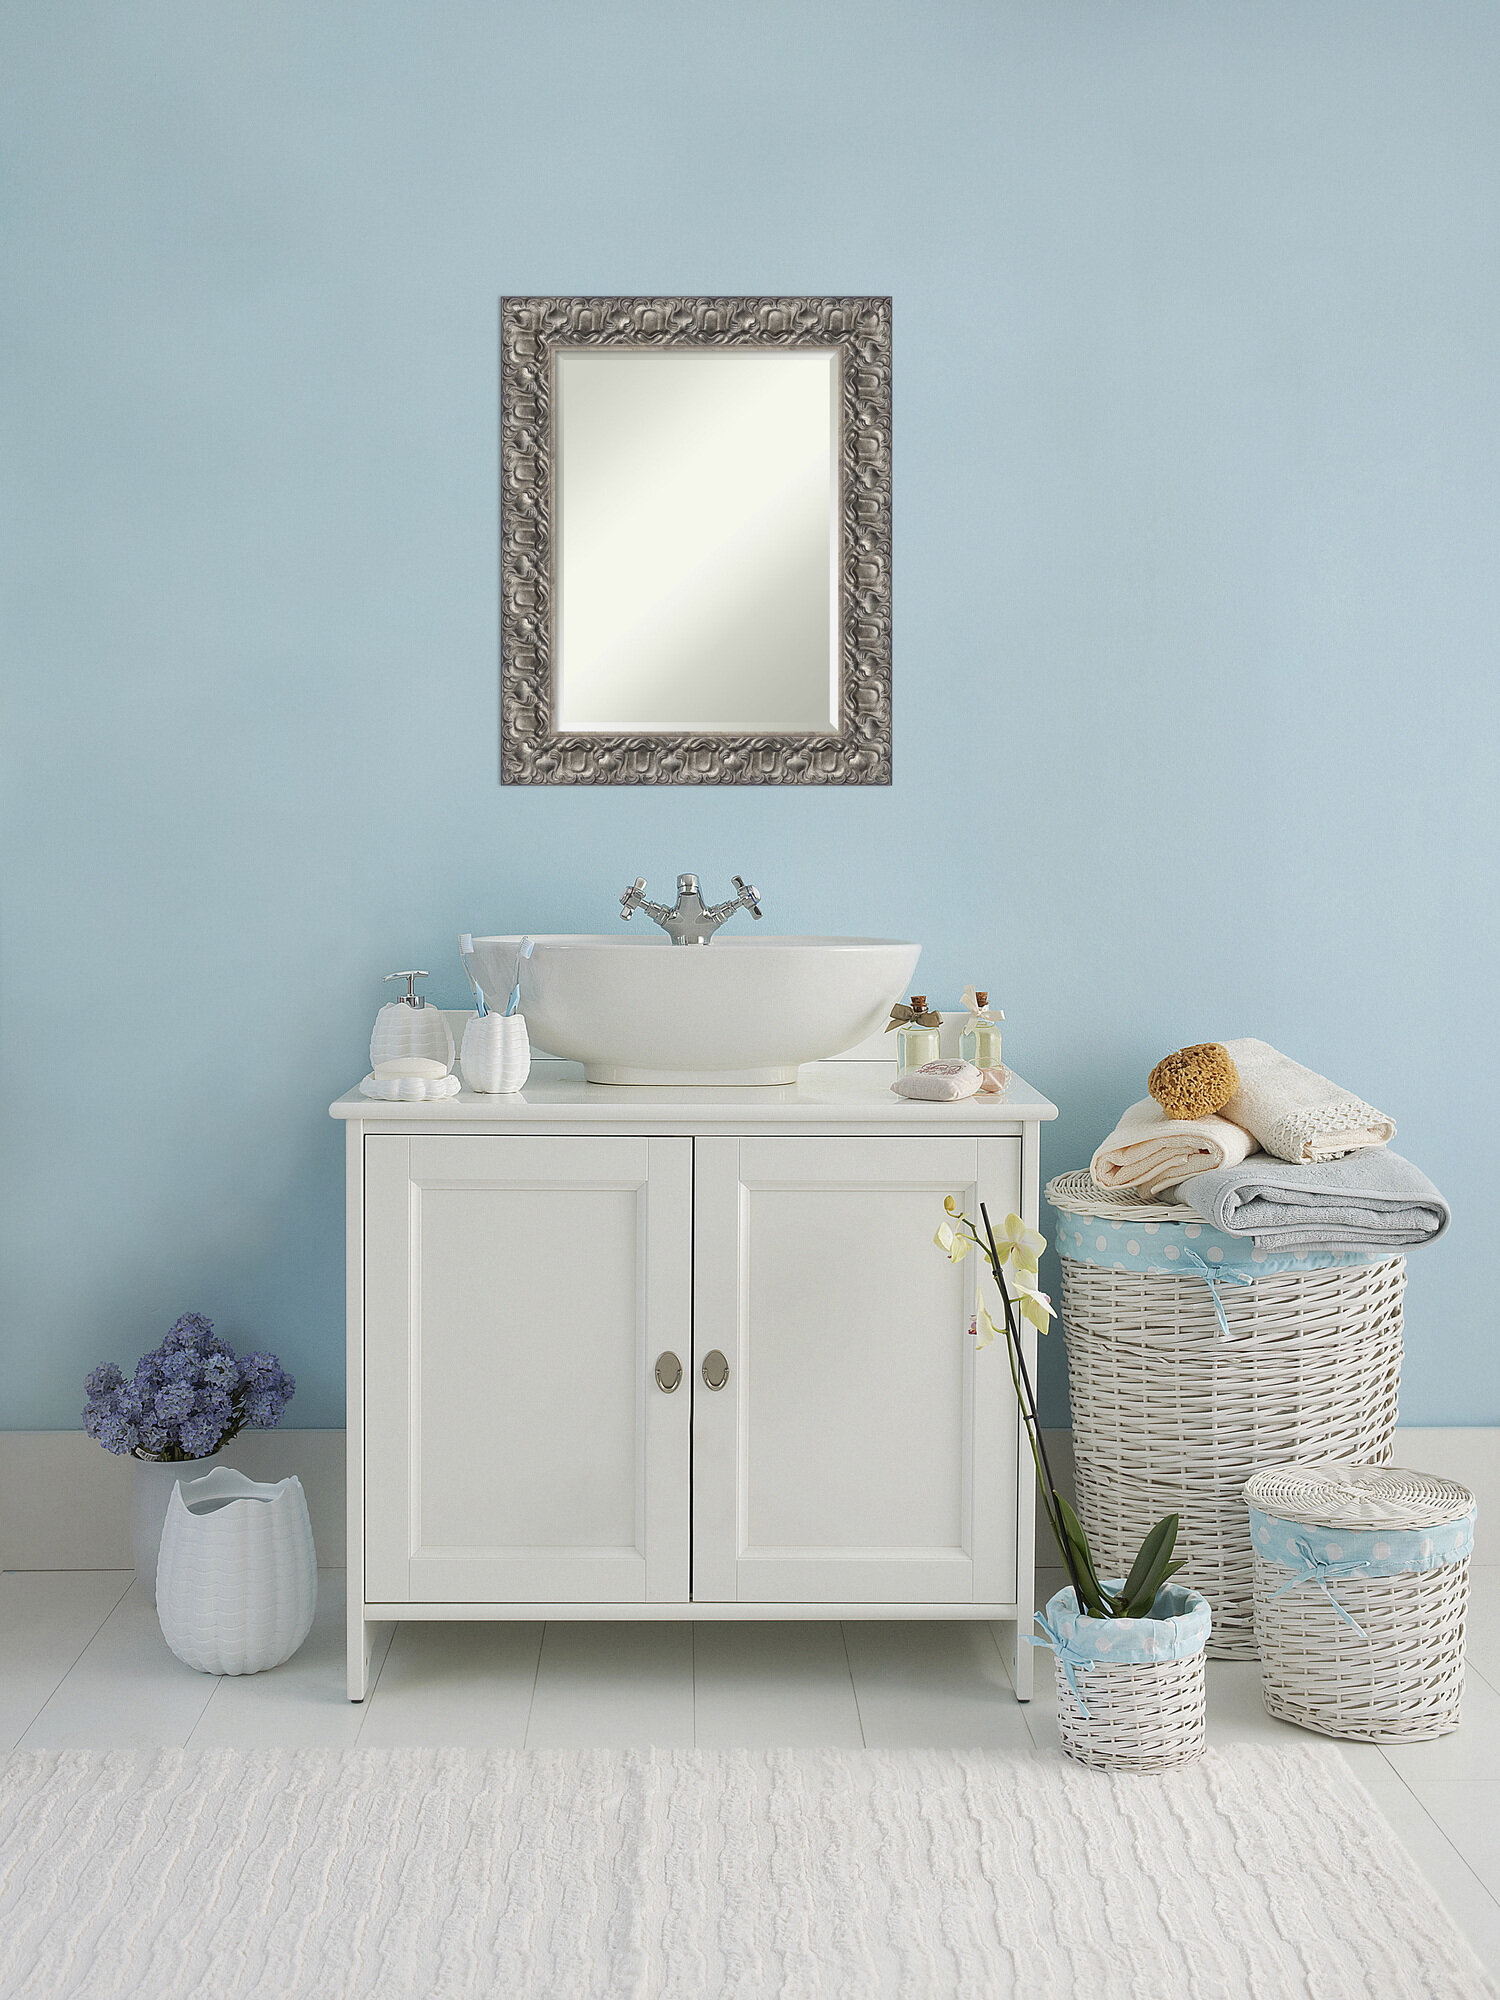 House of Hampton Mccrady Bathroom Accent Mirror | Wayfair